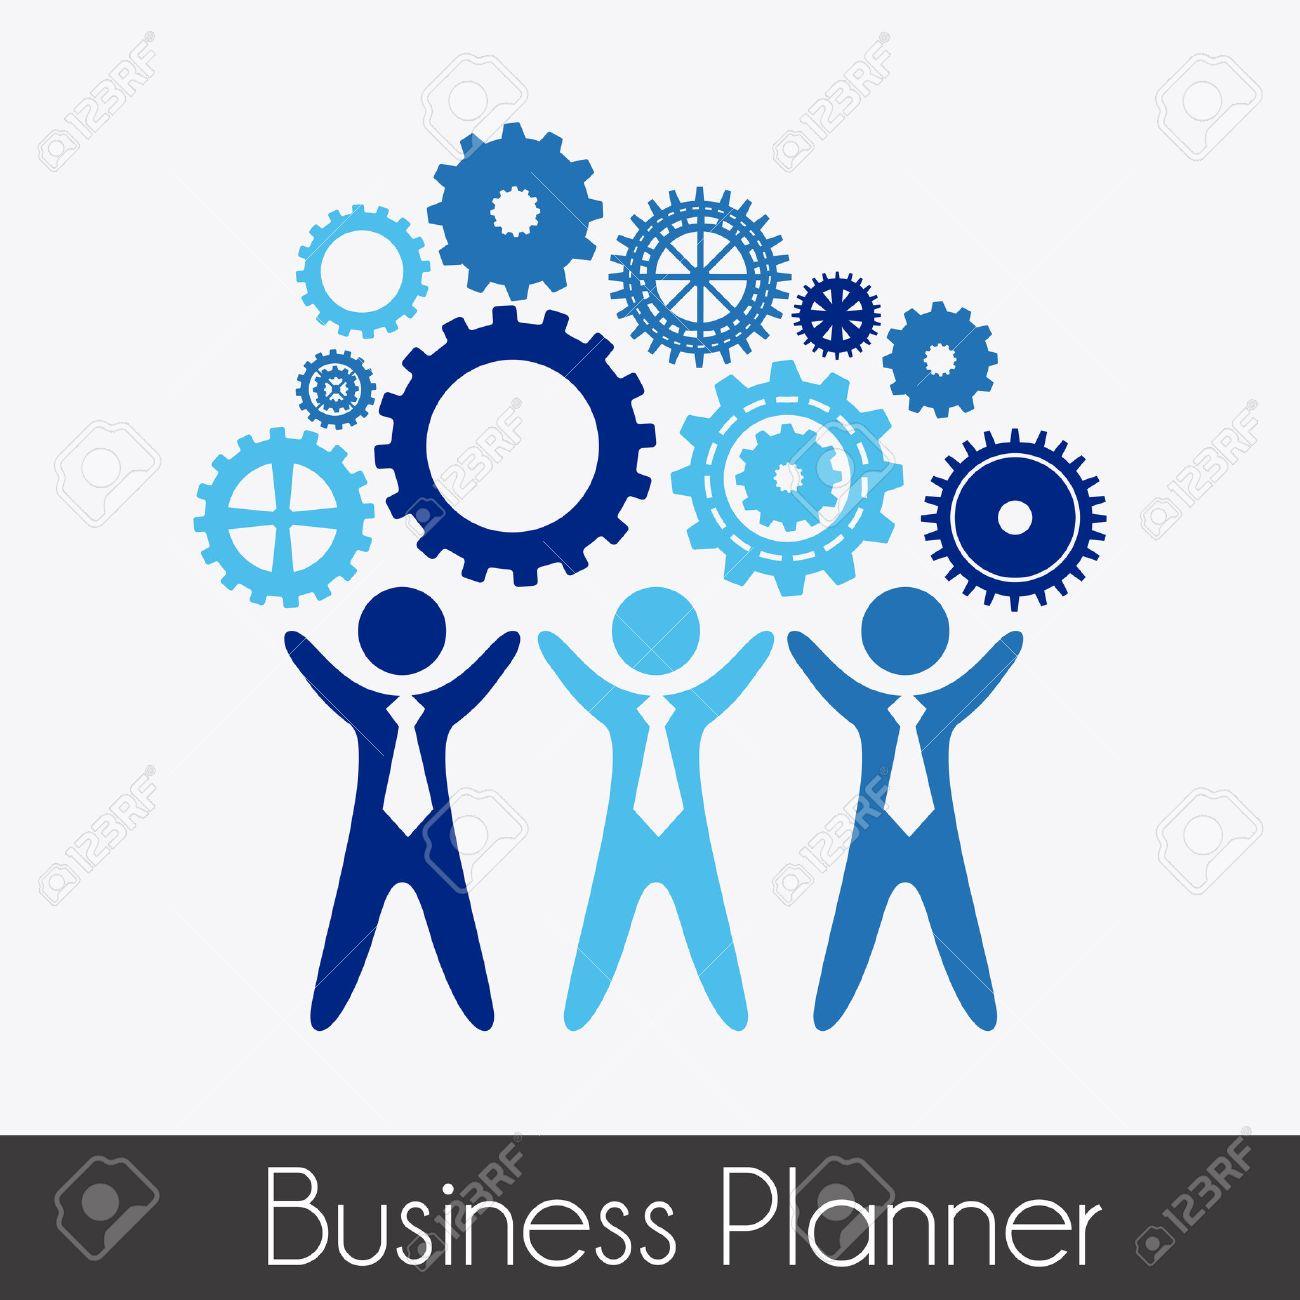 business planner over gray background vector illustration Stock Vector - 22464897